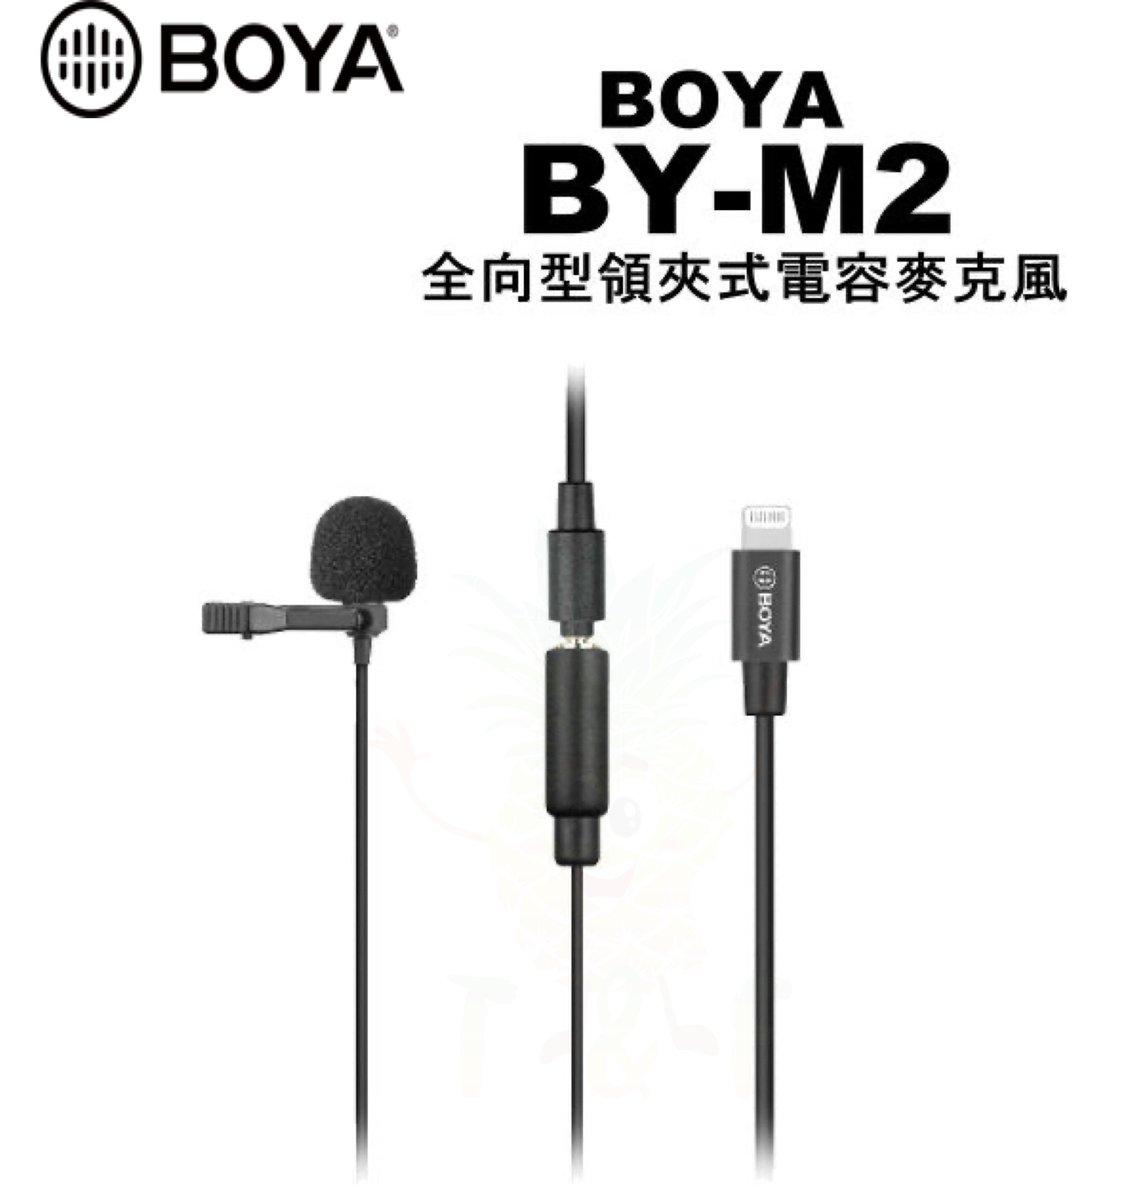 HK ZETA 高清全向式夾領收音咪 (Apple Lightning) BY-M2